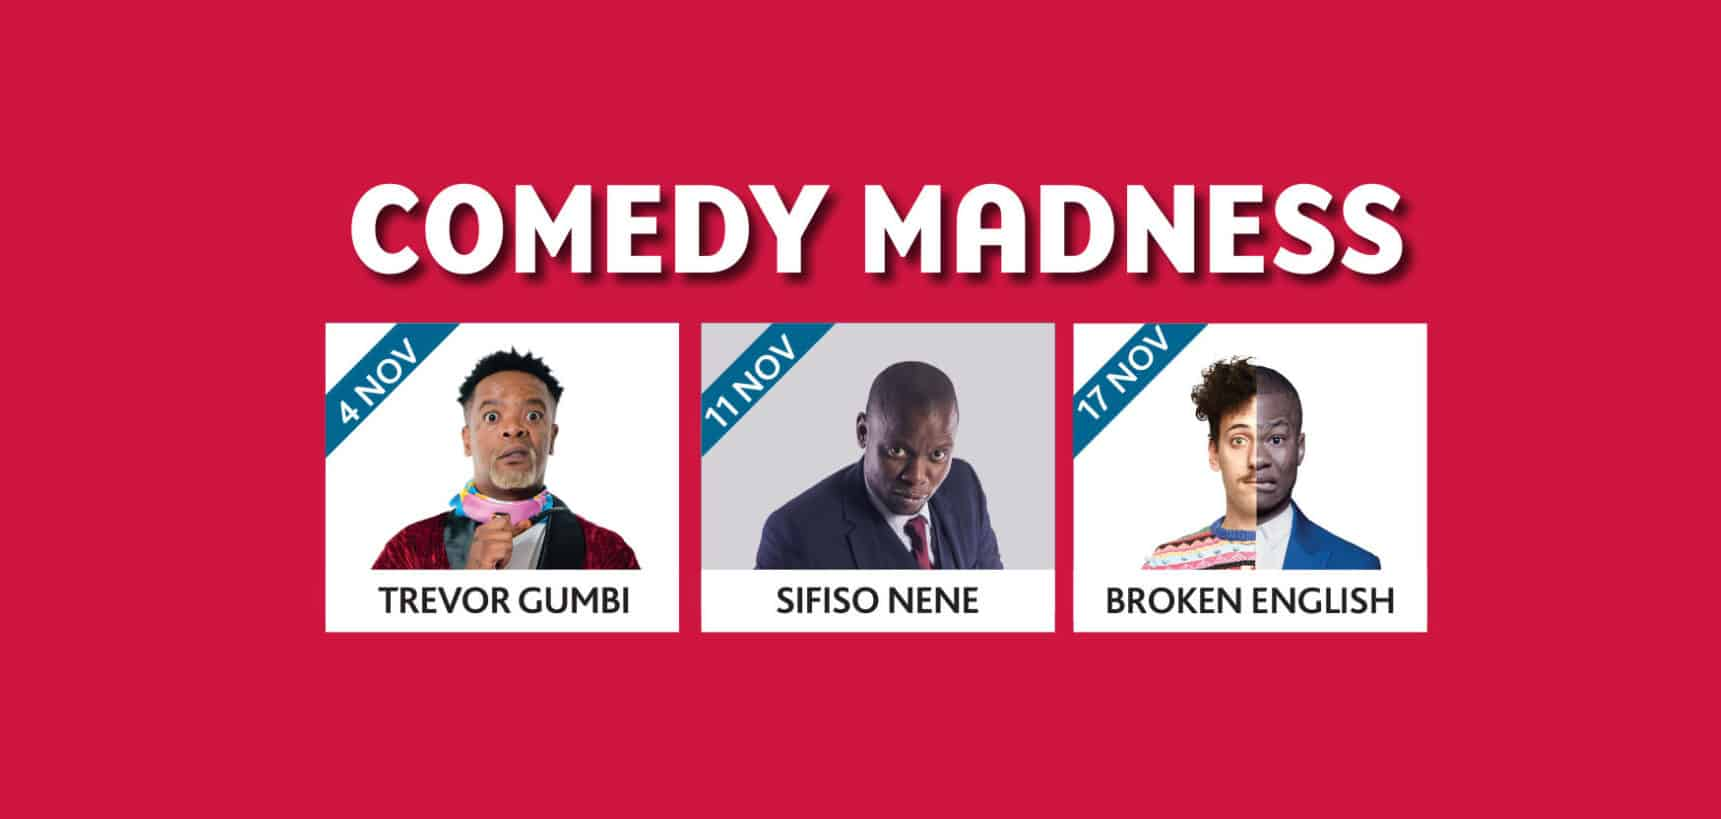 Comedy Madness event at Silverstar Casino